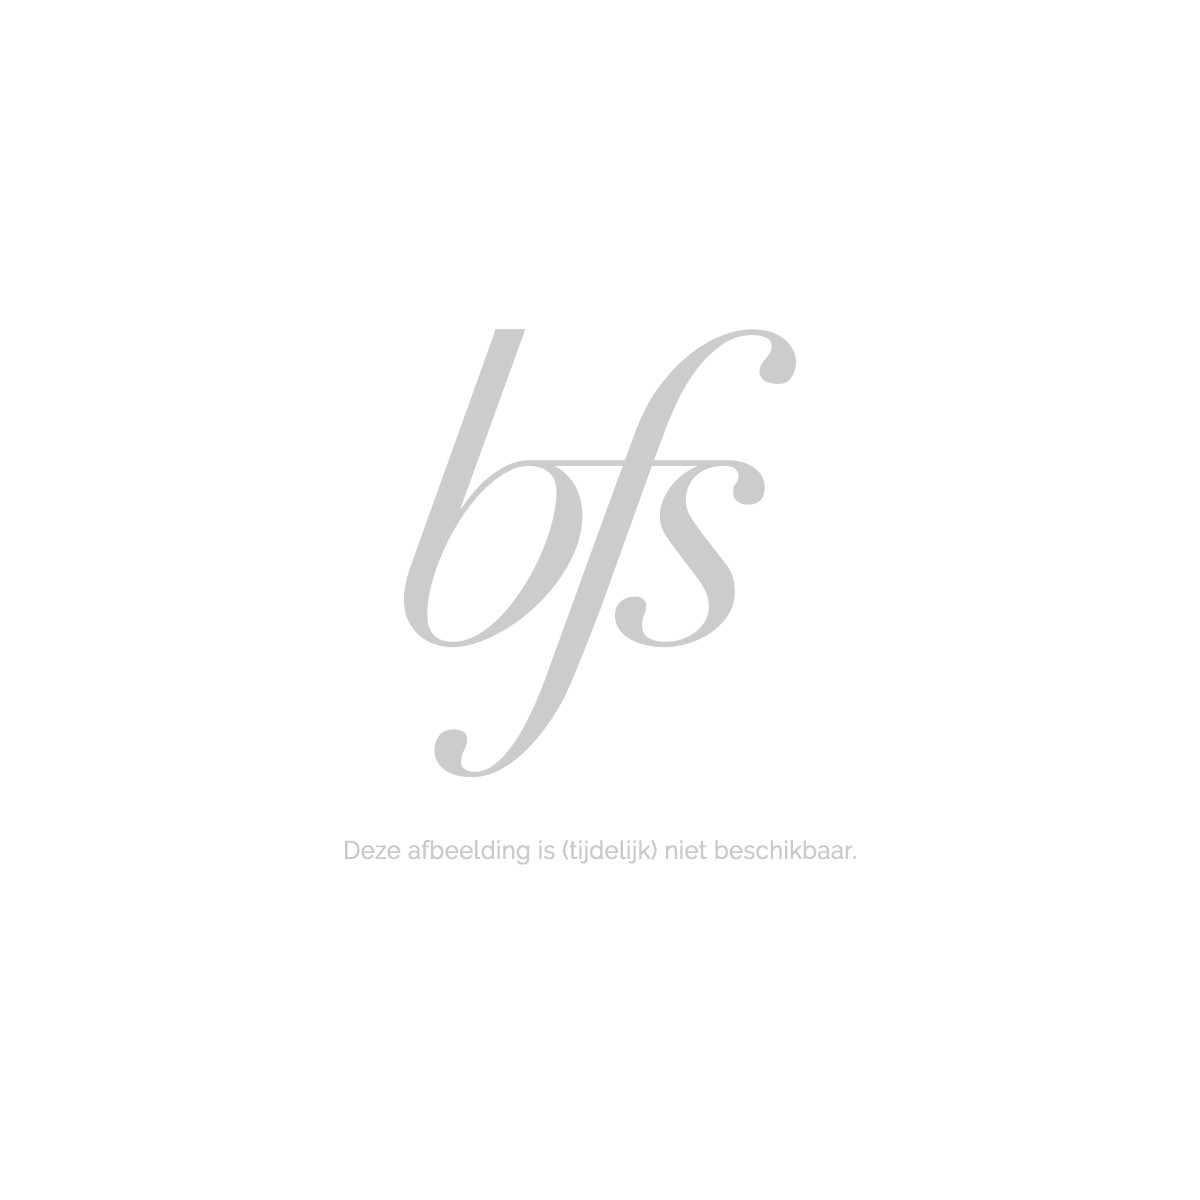 Estee Lauder Revitalizing Supreme Cc Creme Spf10 30 Ml